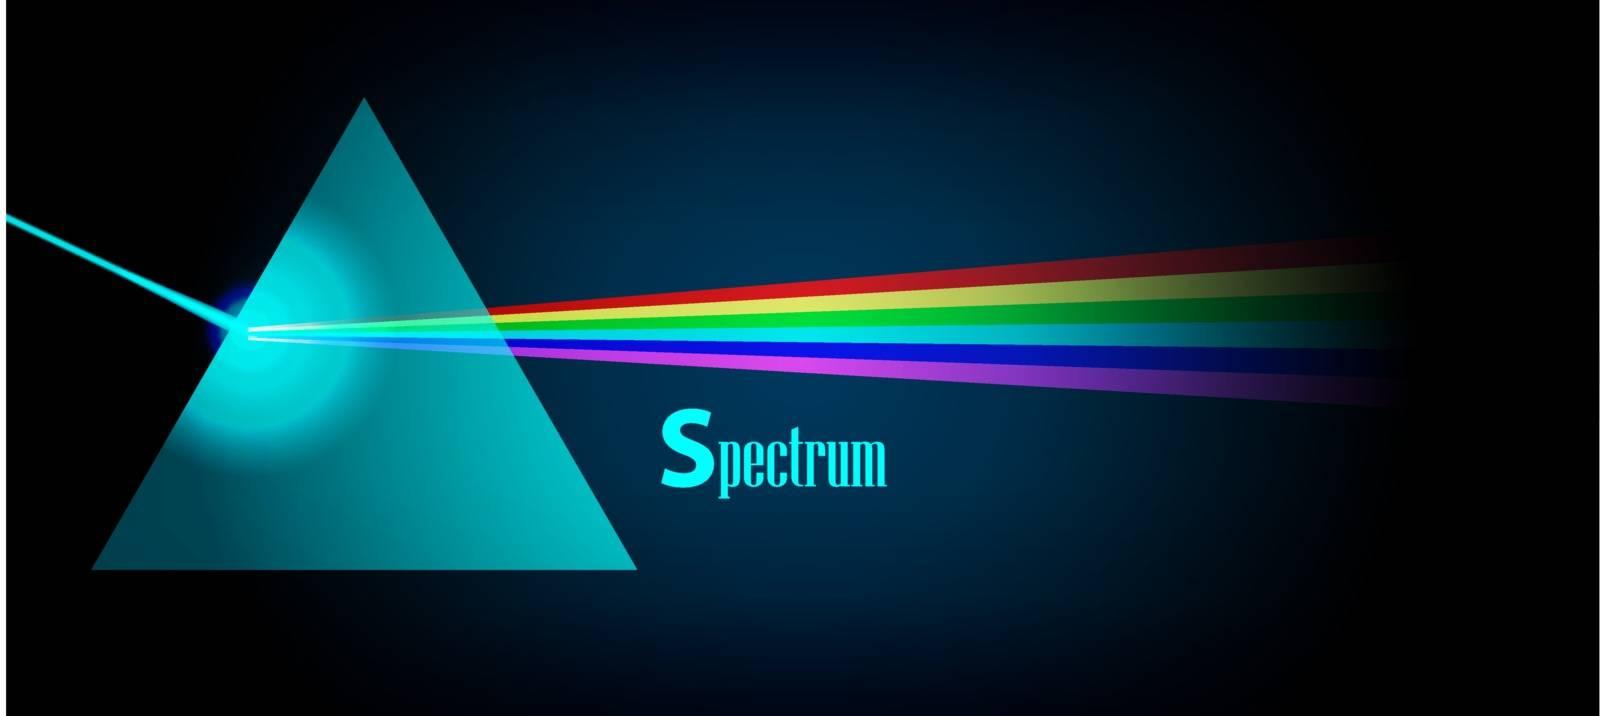 Physics Prism light spectrum eps 10 vector illustration